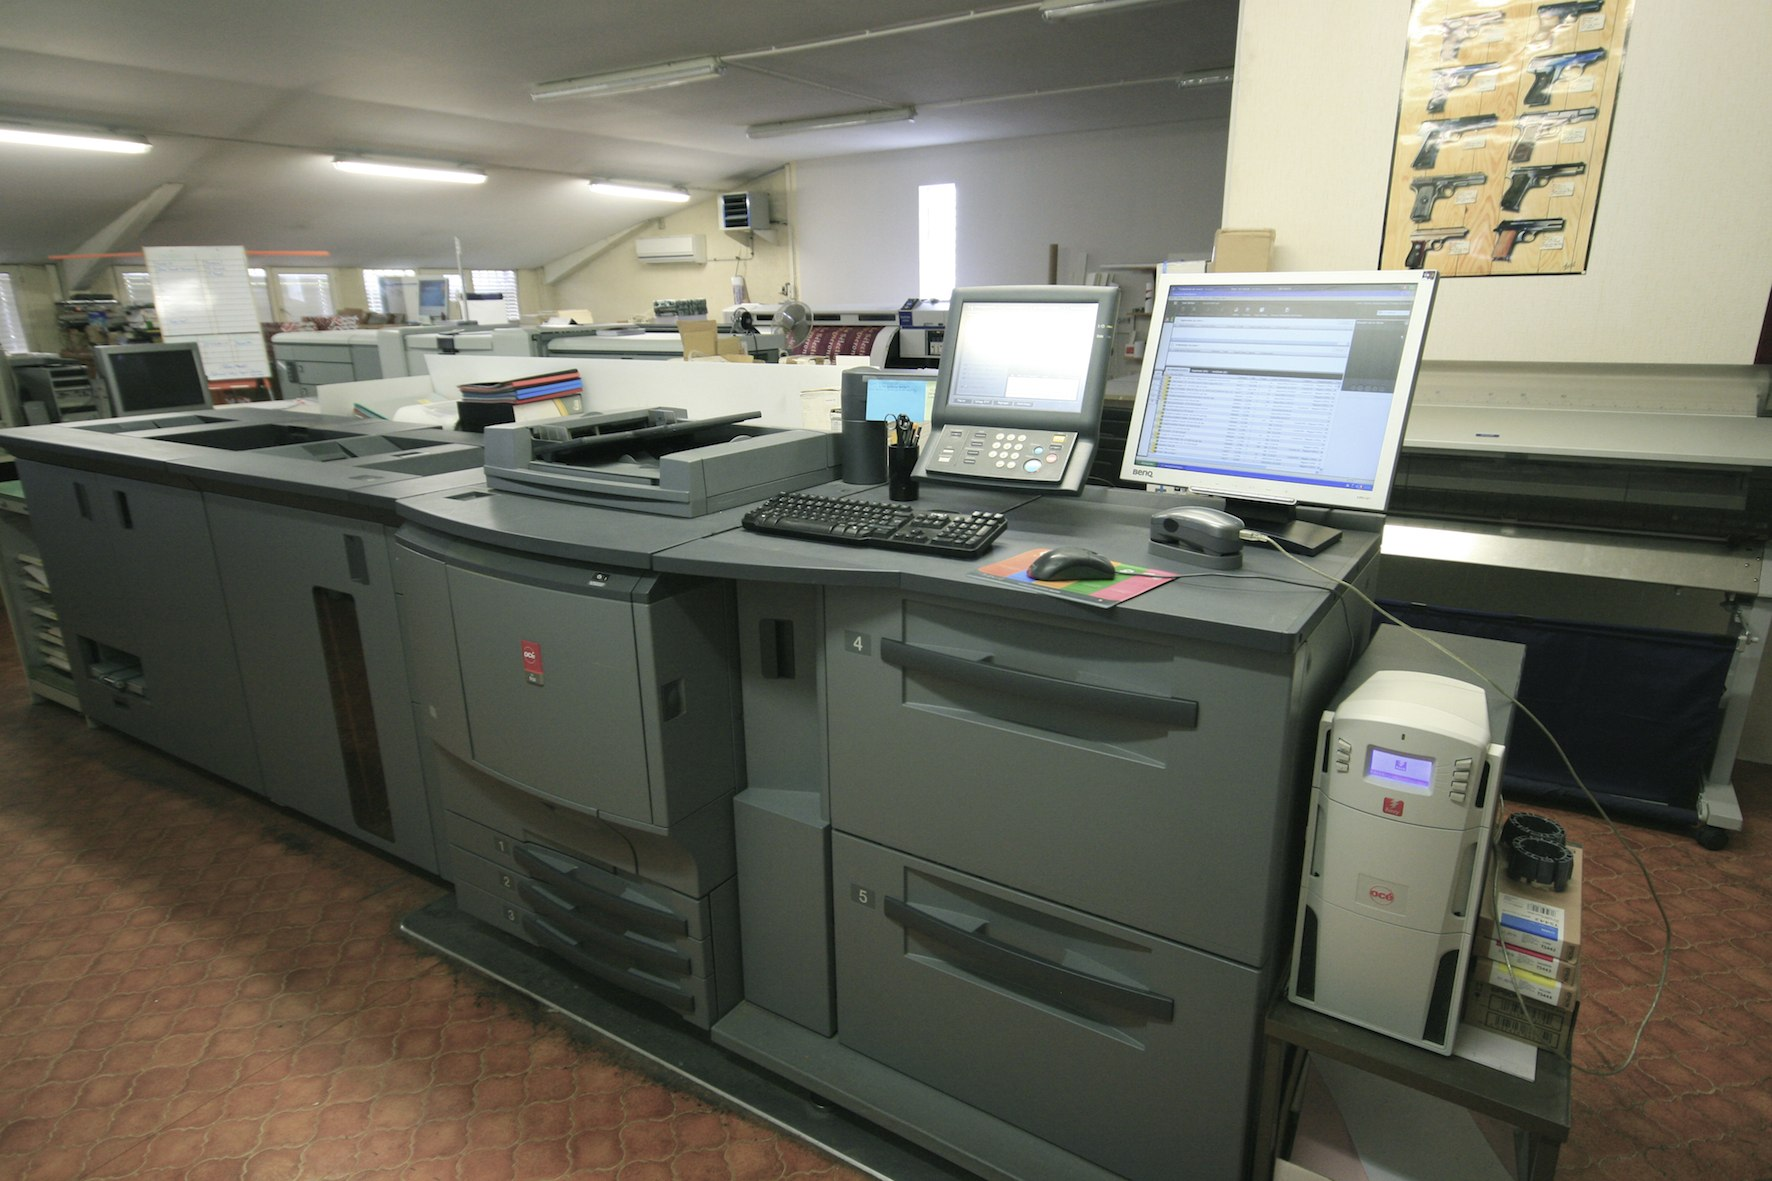 Oce - Konica CS 650 Digital press - Exapro